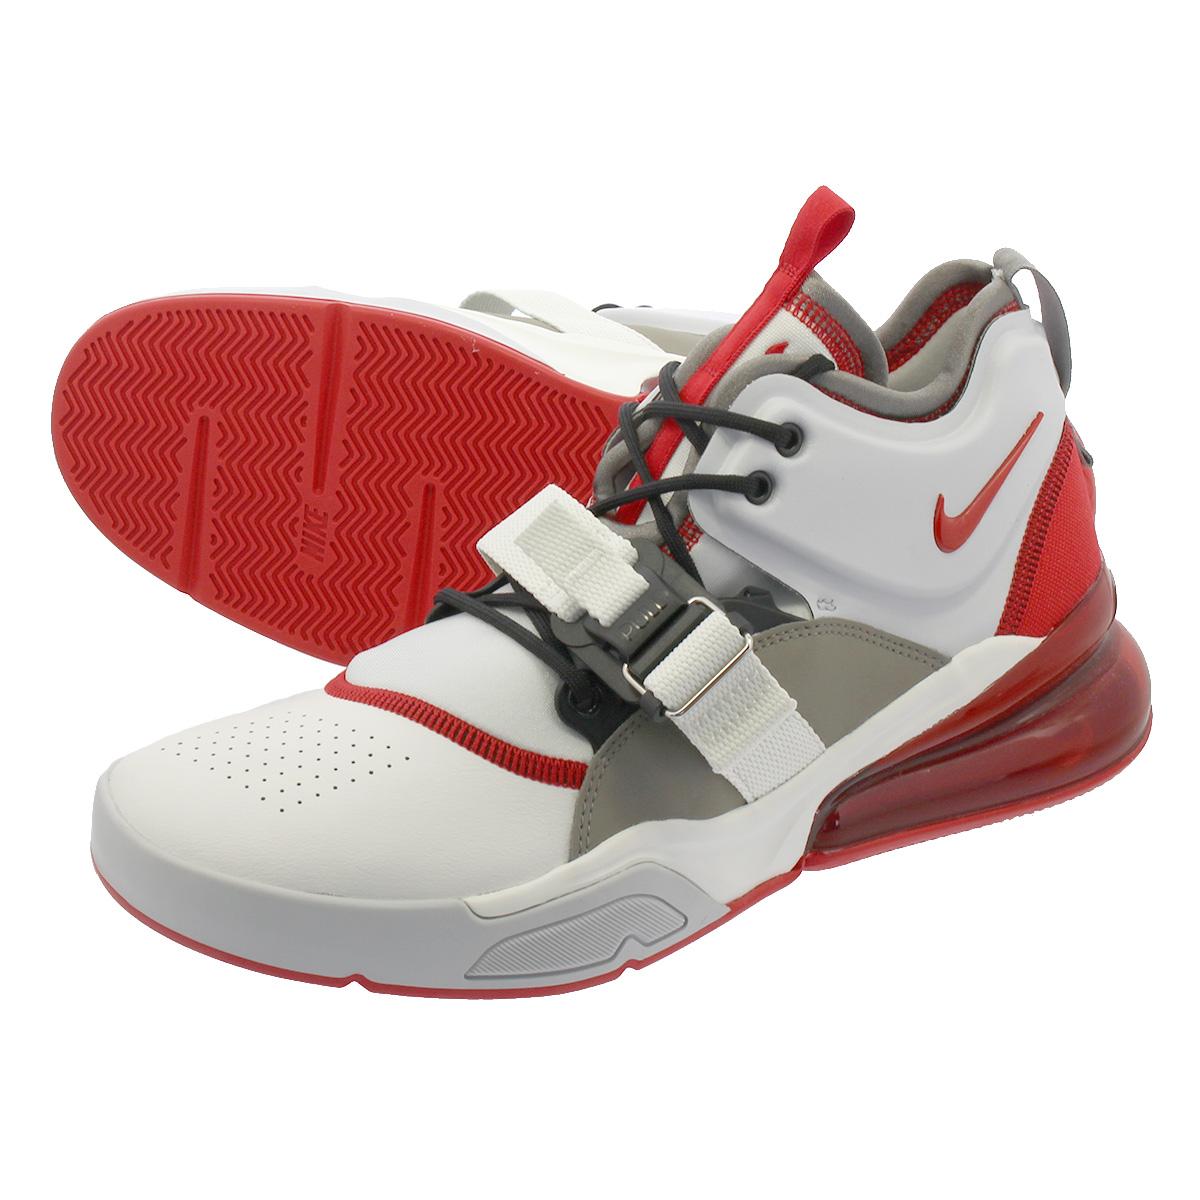 hot sale online 71818 39ab1 NIKE AIR FORCE 270 Nike air force 270 WHITE ah6772-102